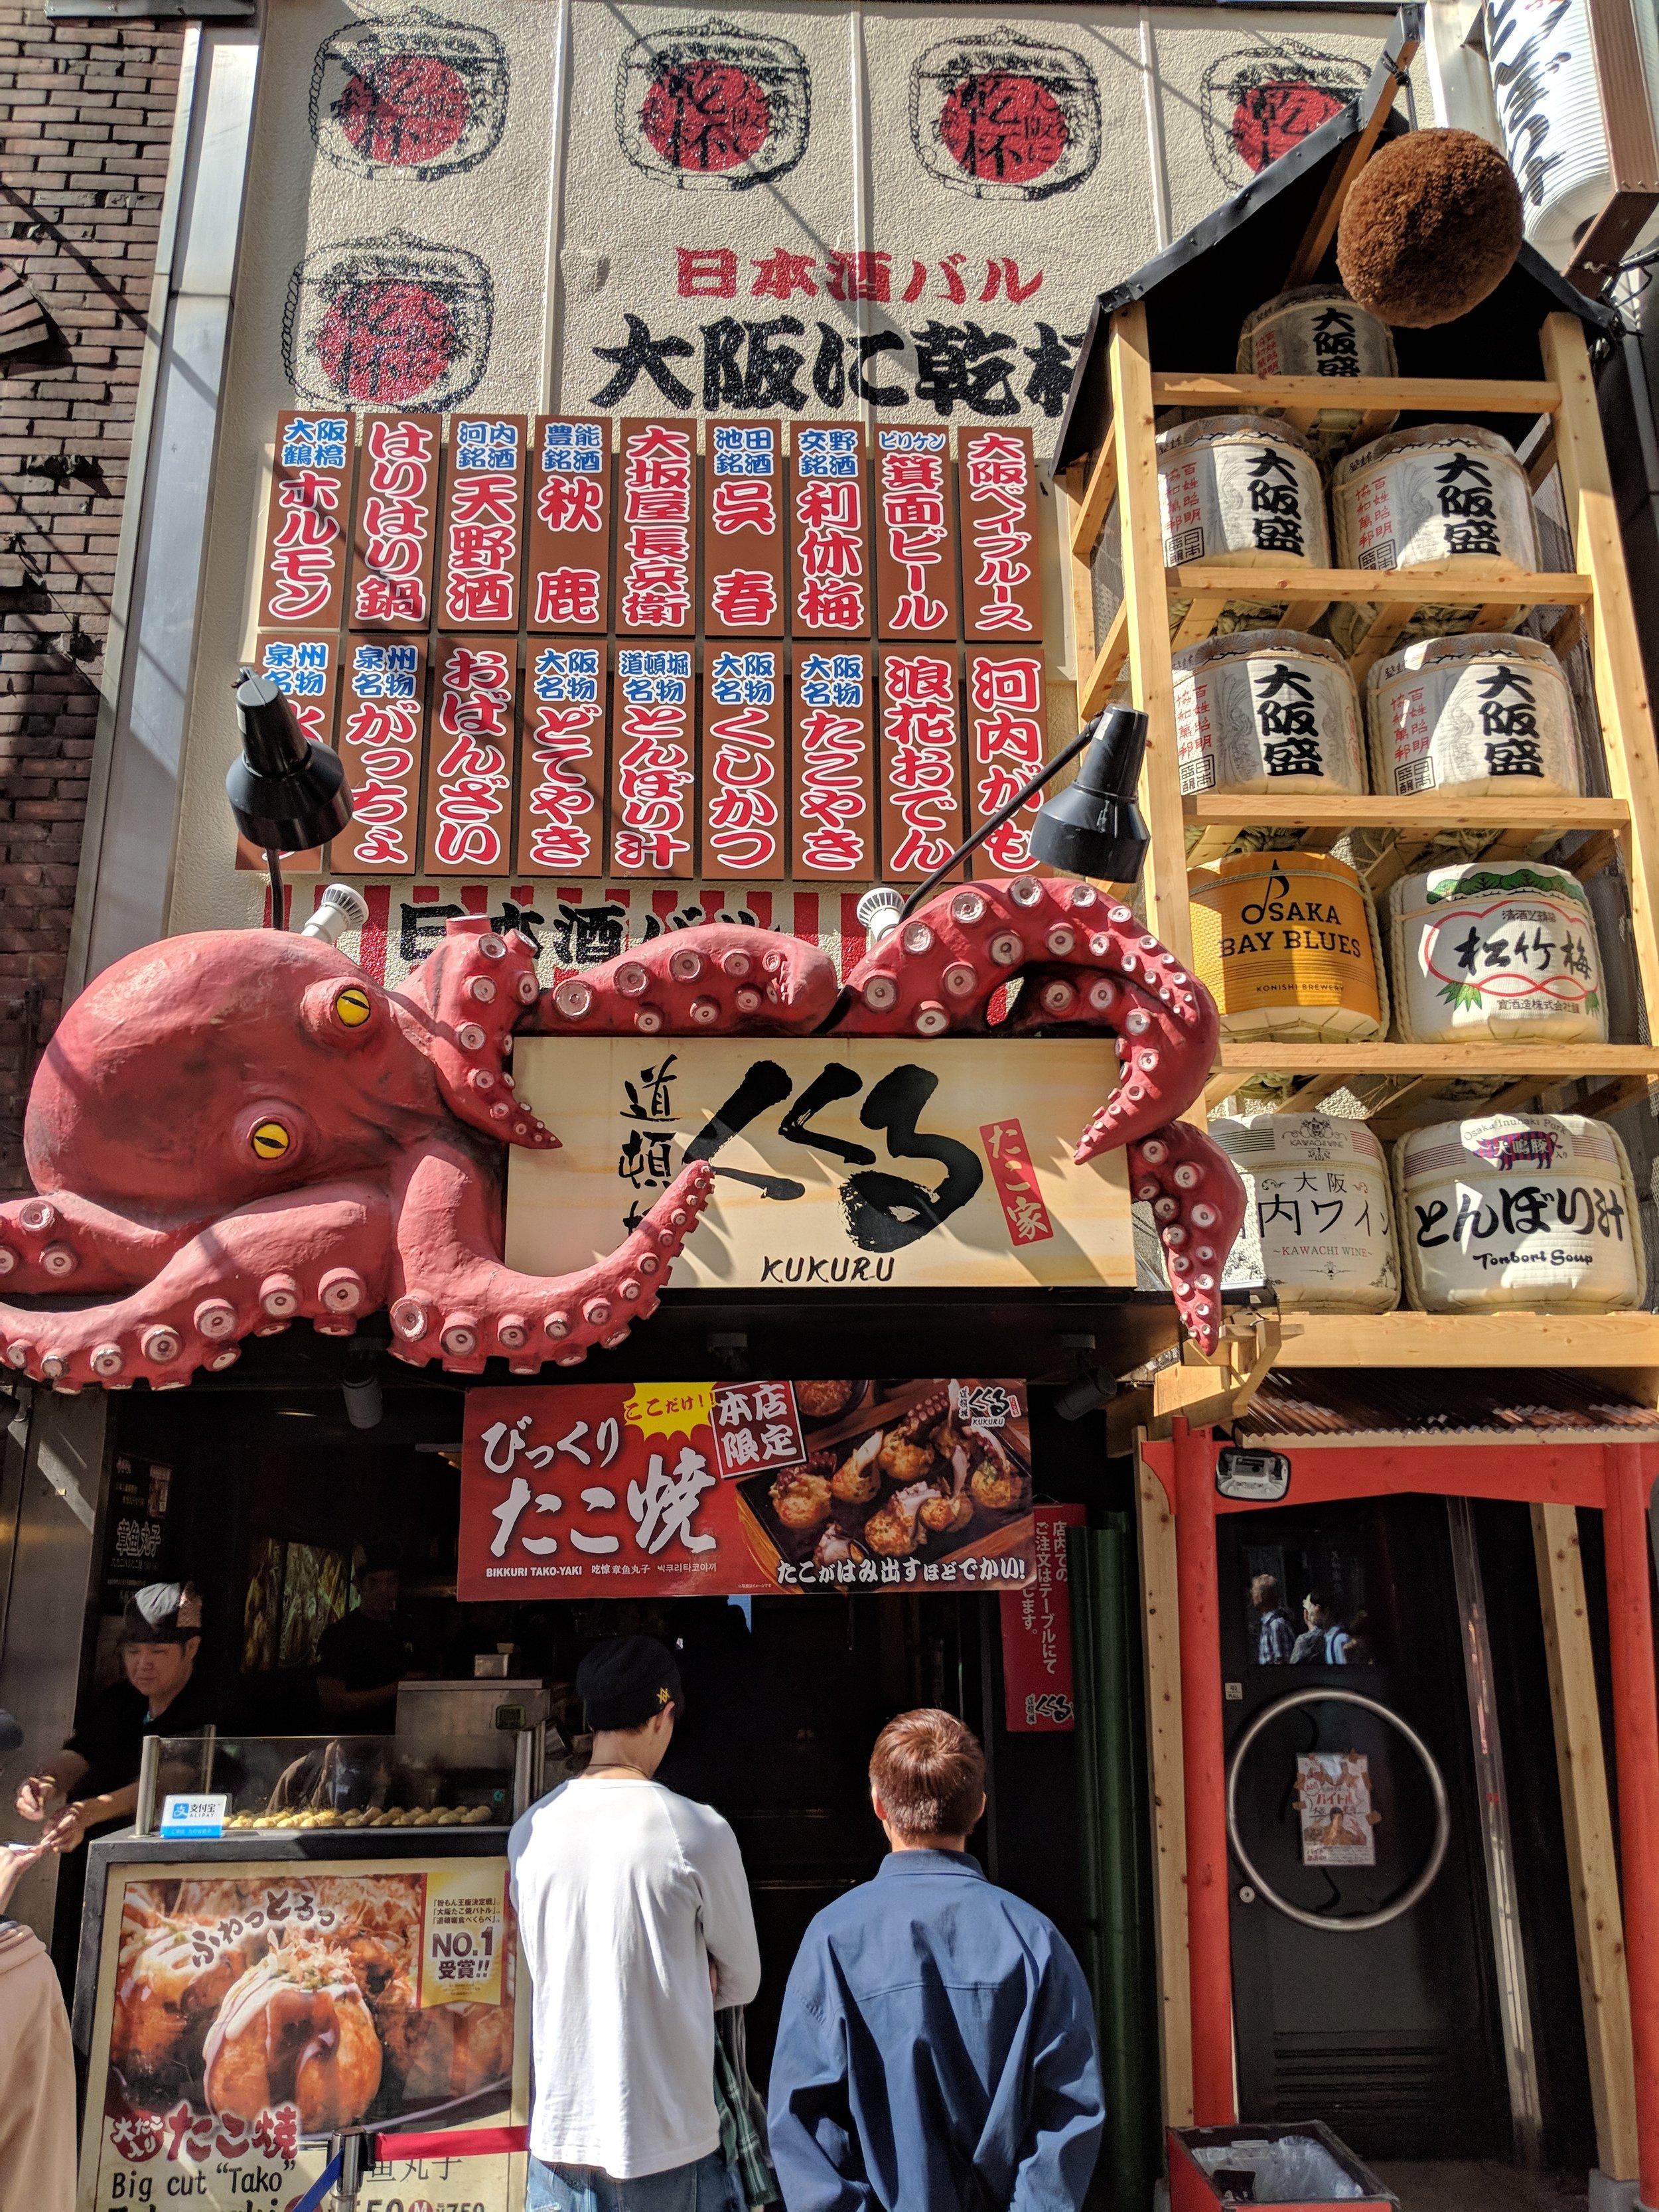 Kukuru, famous for takoyaki (like a hot donut hole with a piece of octopus inside)